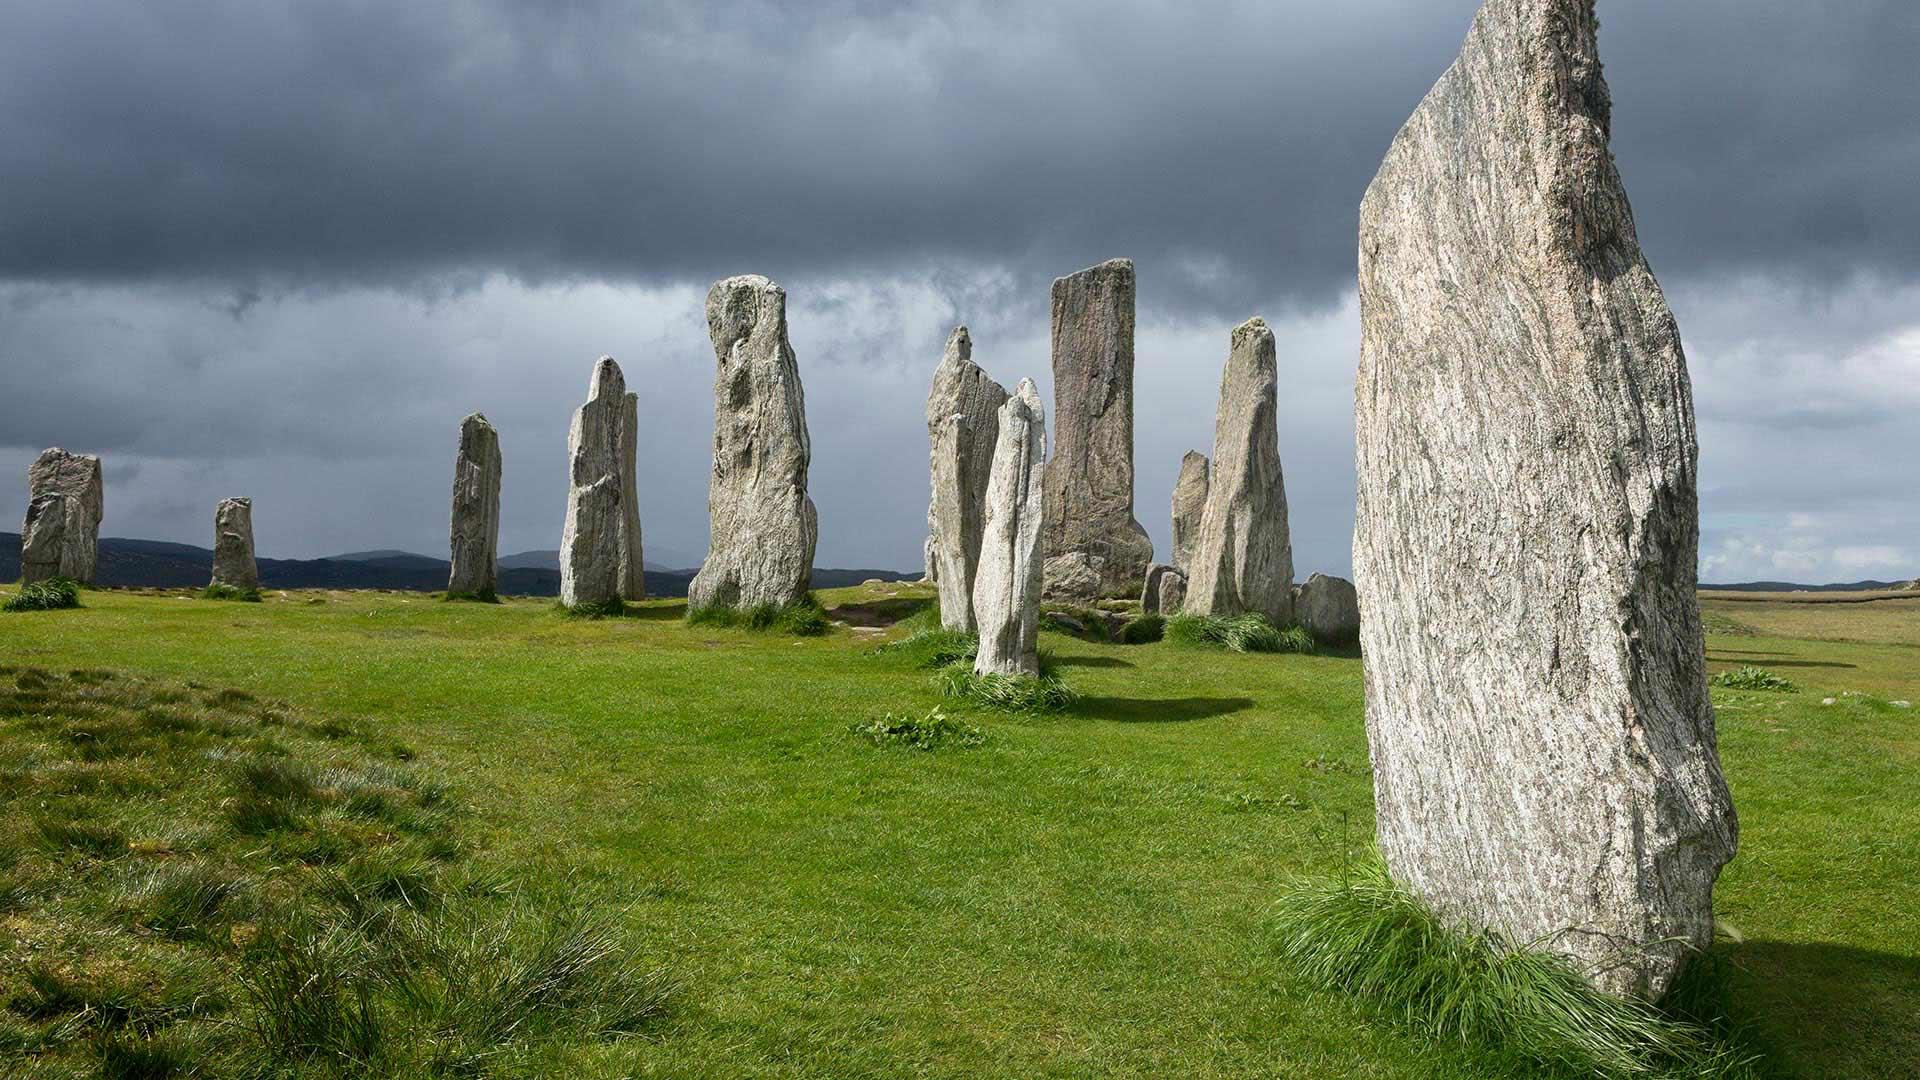 England Wallpaper Hd Grand Tour Of Scotland 17 Days 16 Nights Scotland